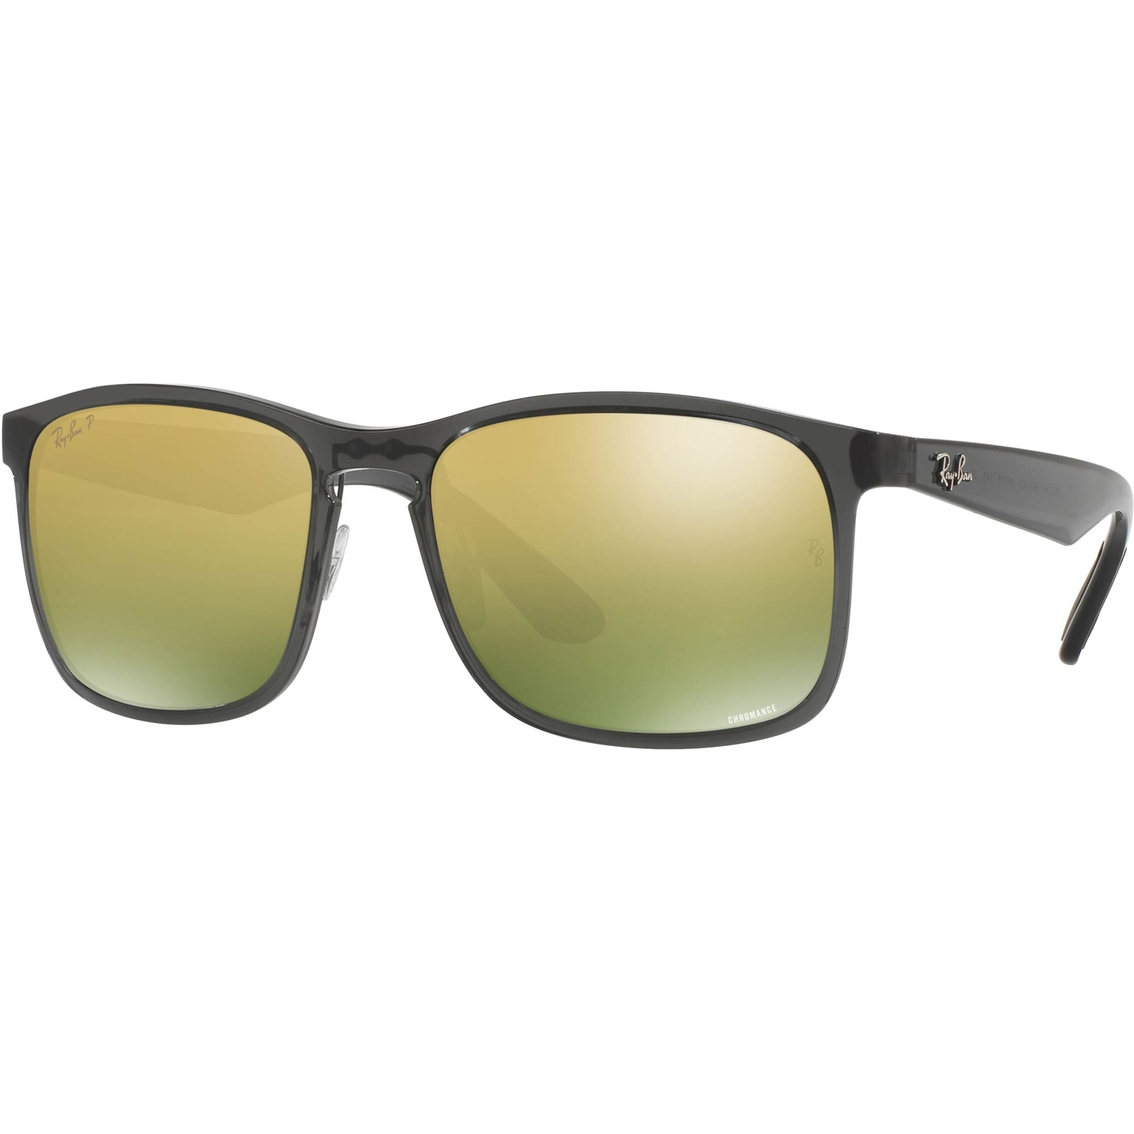 Ray Ban Mirrored Lens Wayfarer Plastic Sunglasses Men S Sunglasses